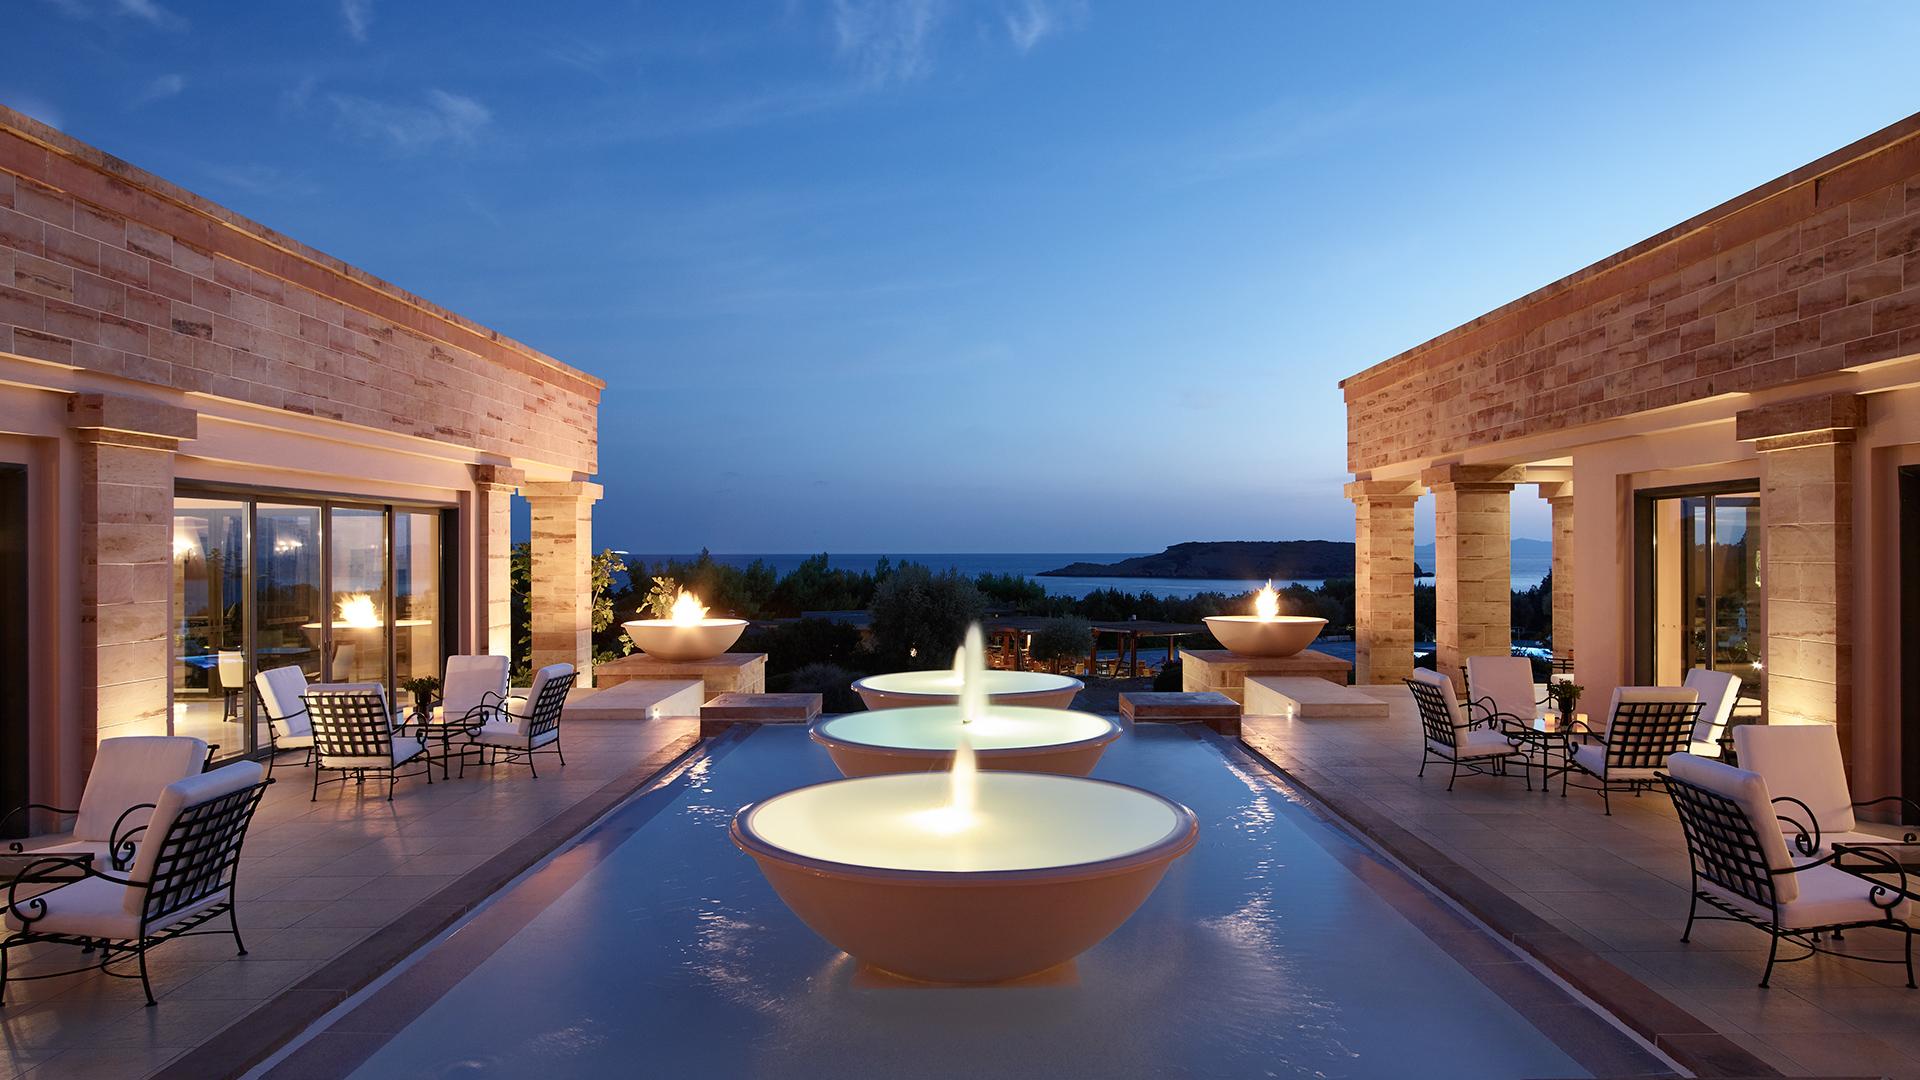 Cape Sounio Luxushotel Athen